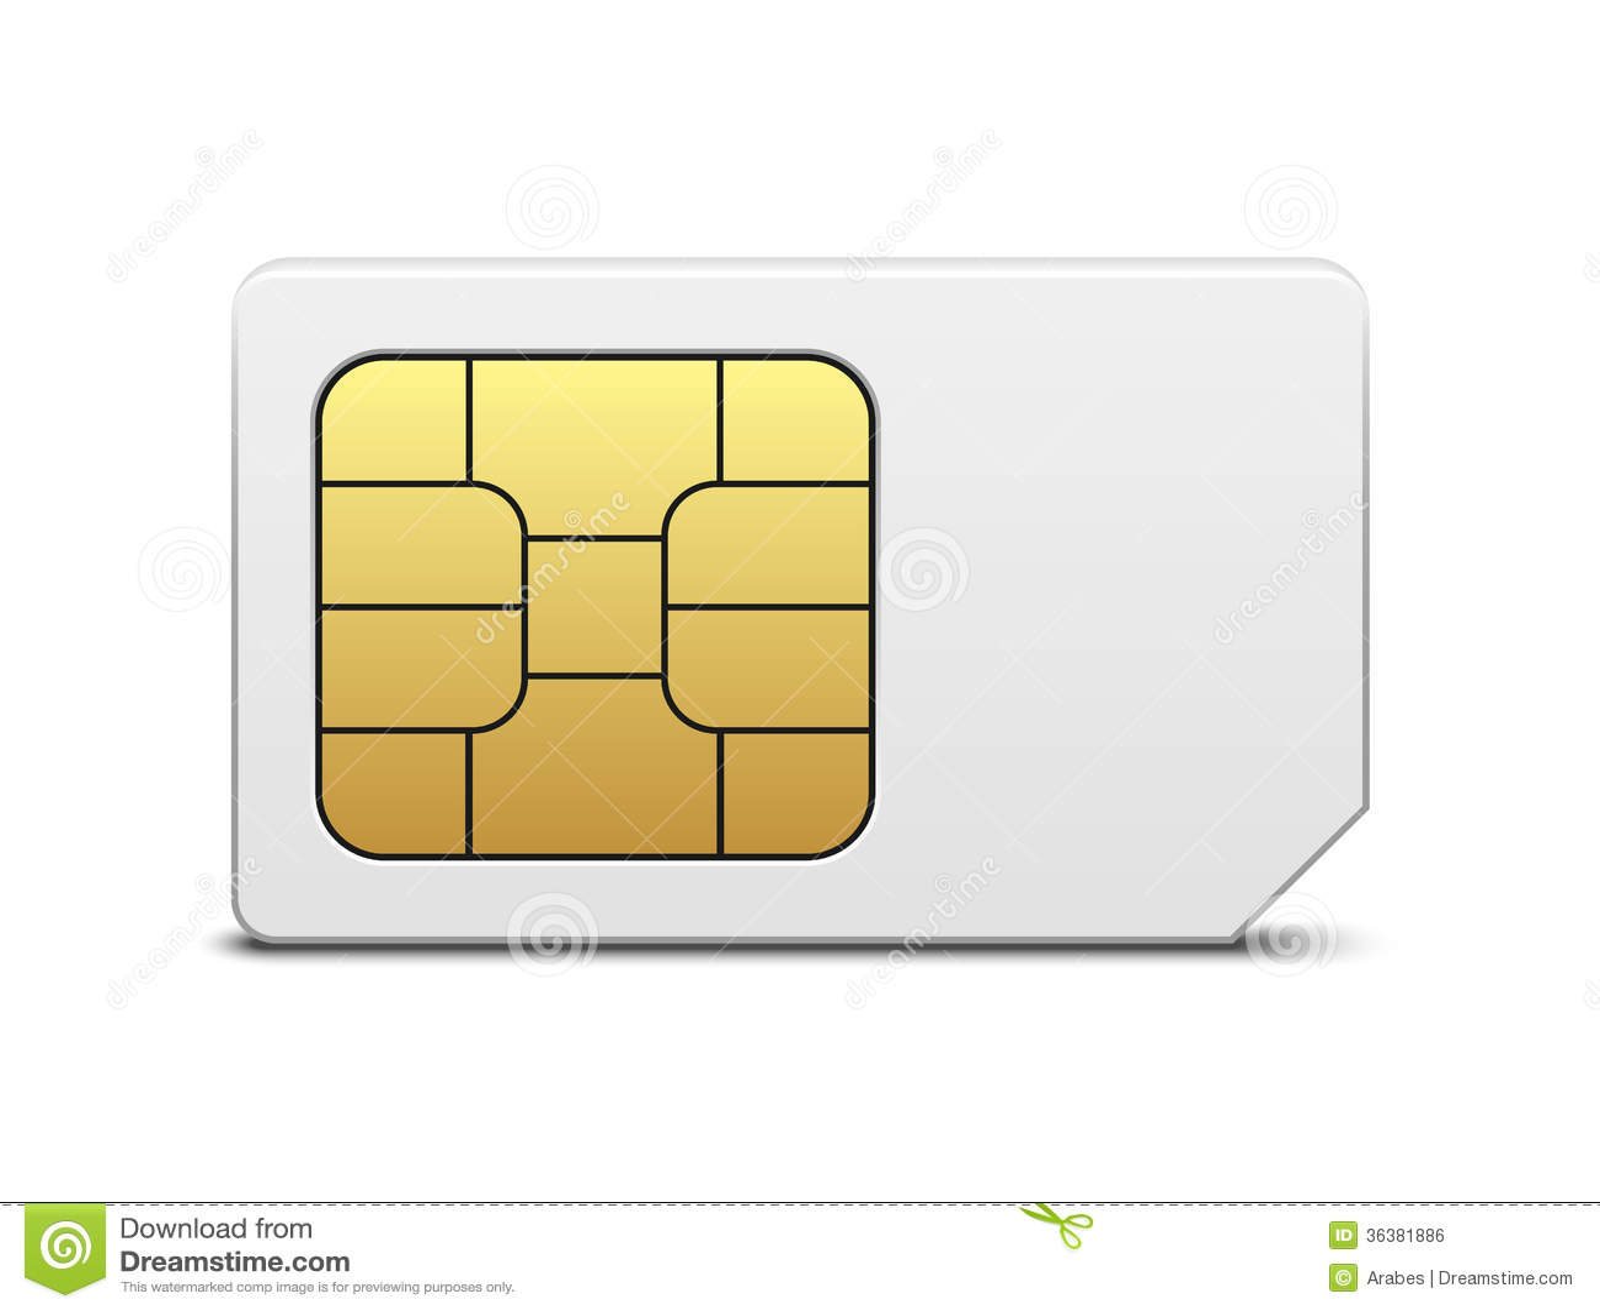 sim karte stock abbildung bild von zahl illustrator 36381886. Black Bedroom Furniture Sets. Home Design Ideas